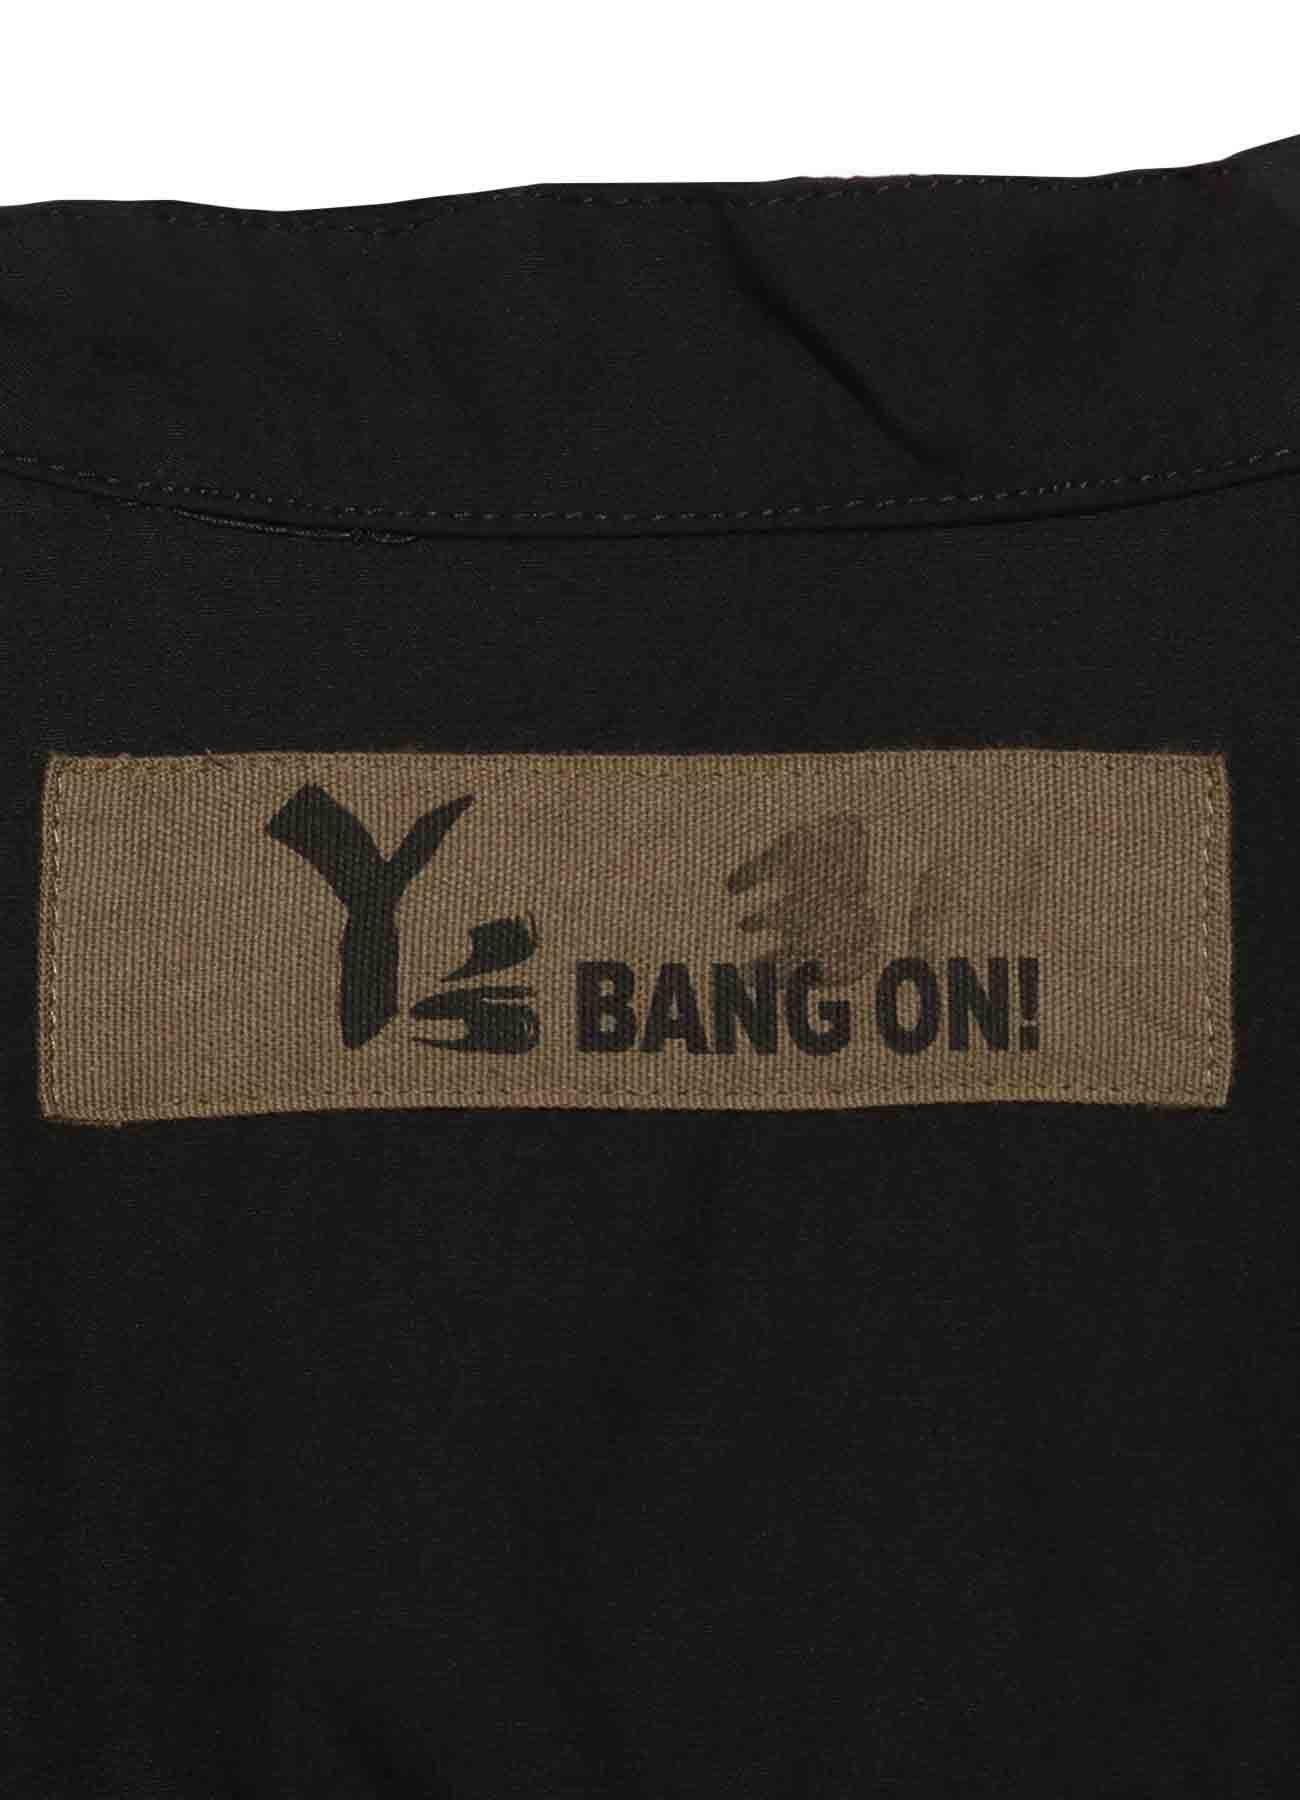 Y's BANG ON!No.30 Hooded-Shirts Cotton broad